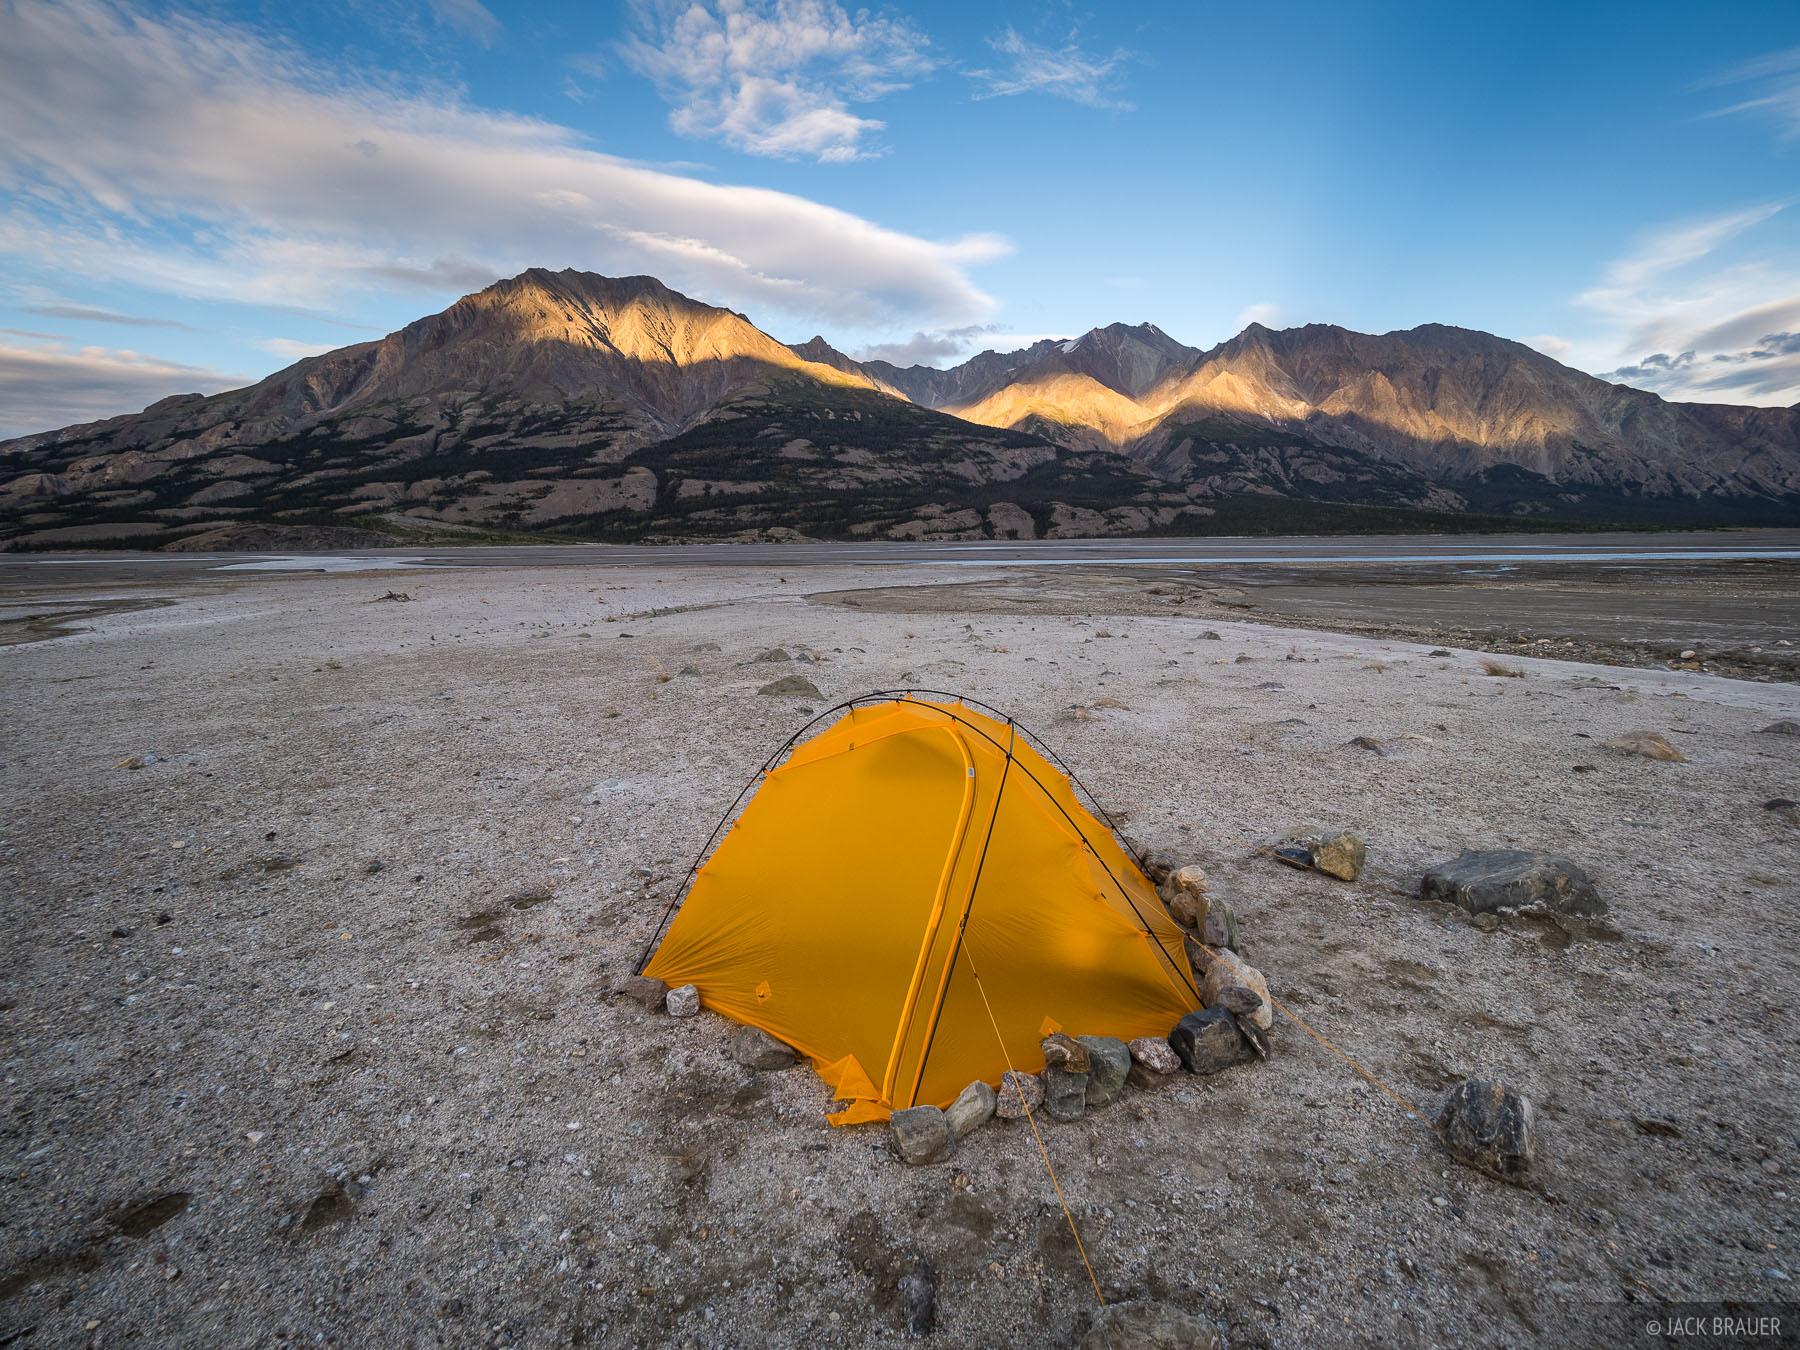 Canada, Kluane National Park, Slims River, Yukon, tent, photo